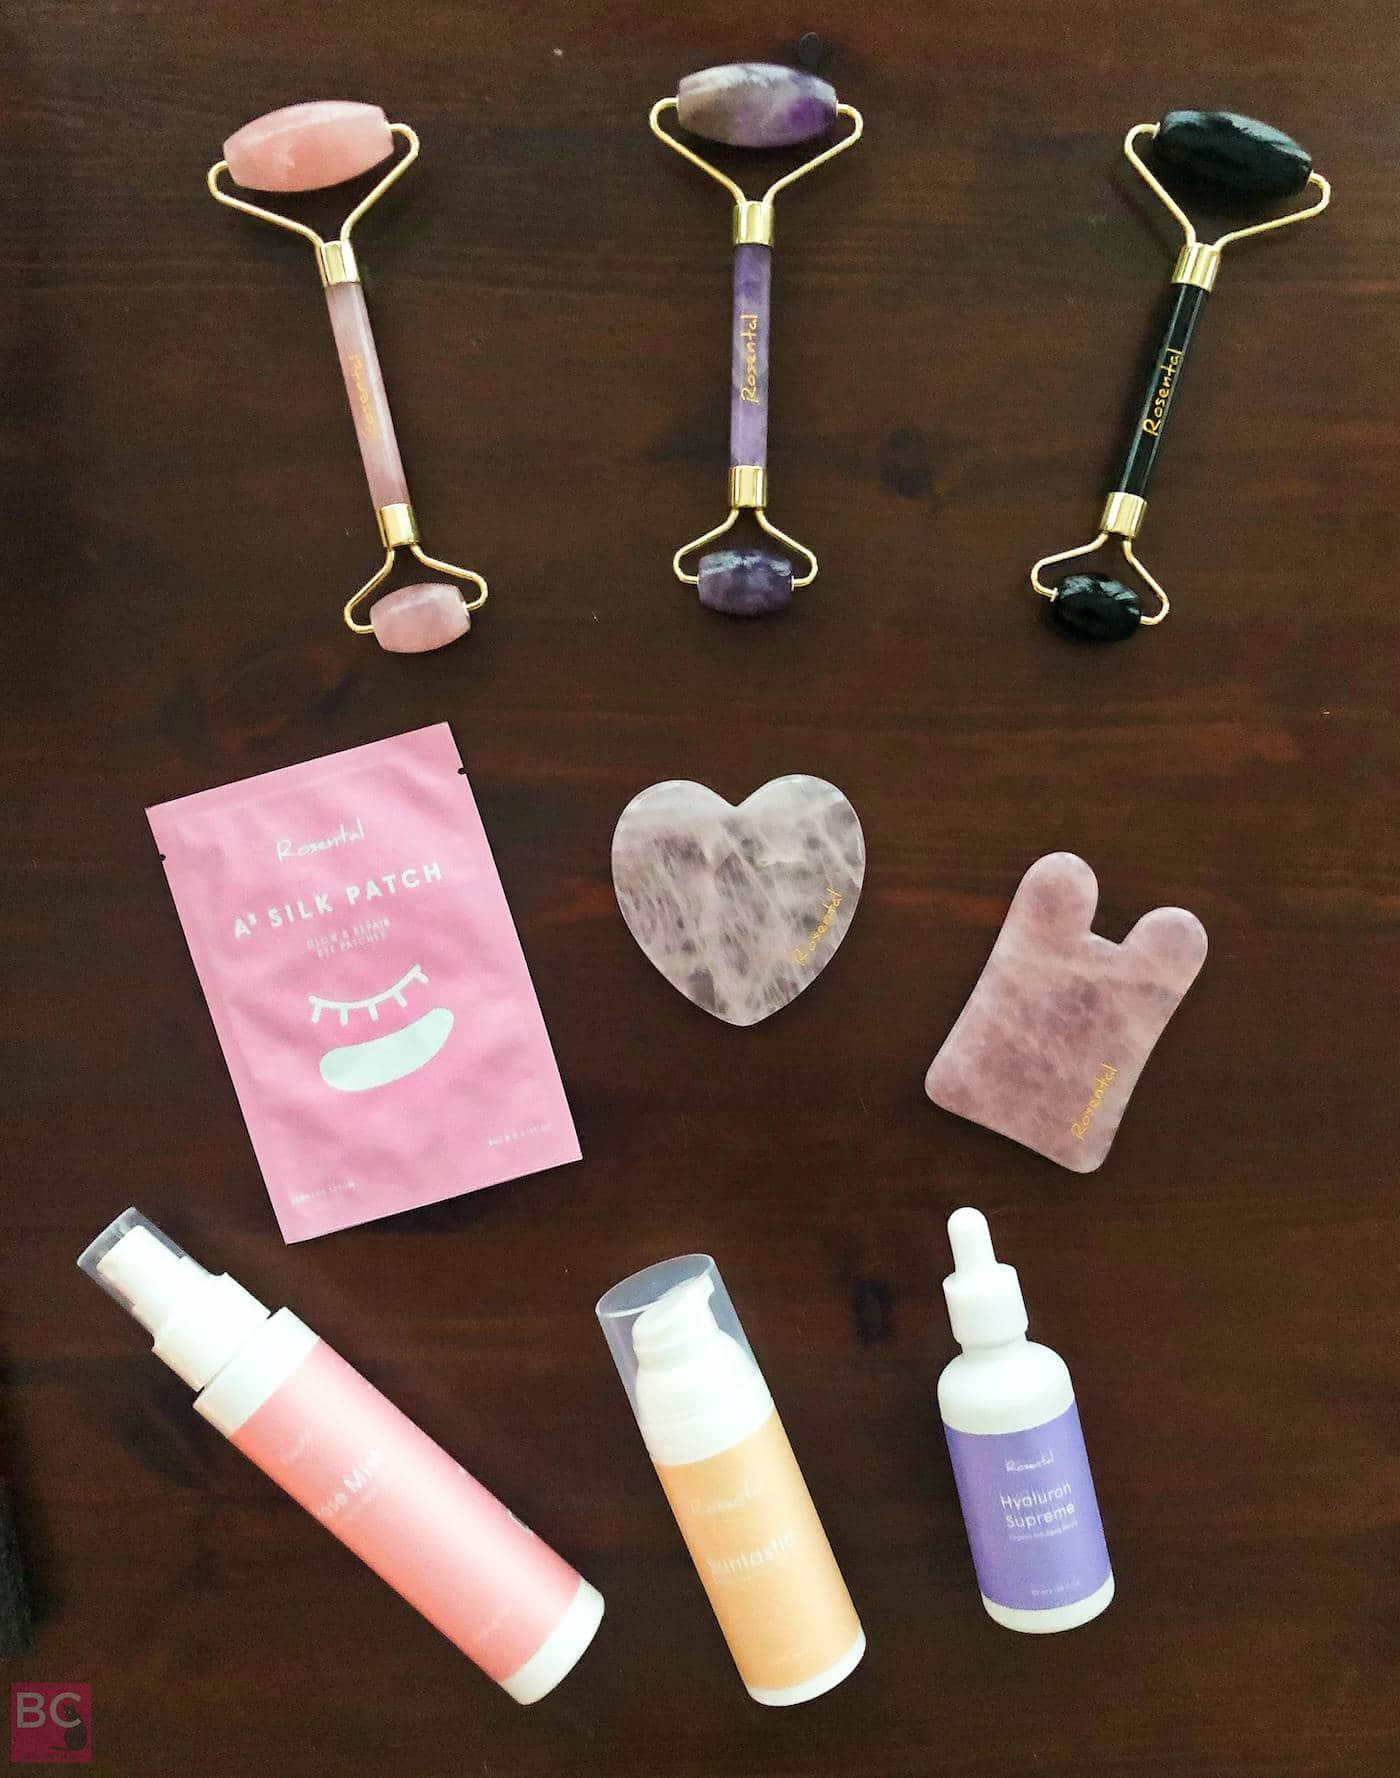 Rosental Organics Beauty Roller Erfahrungen Massagestein Sprays Serum Maske